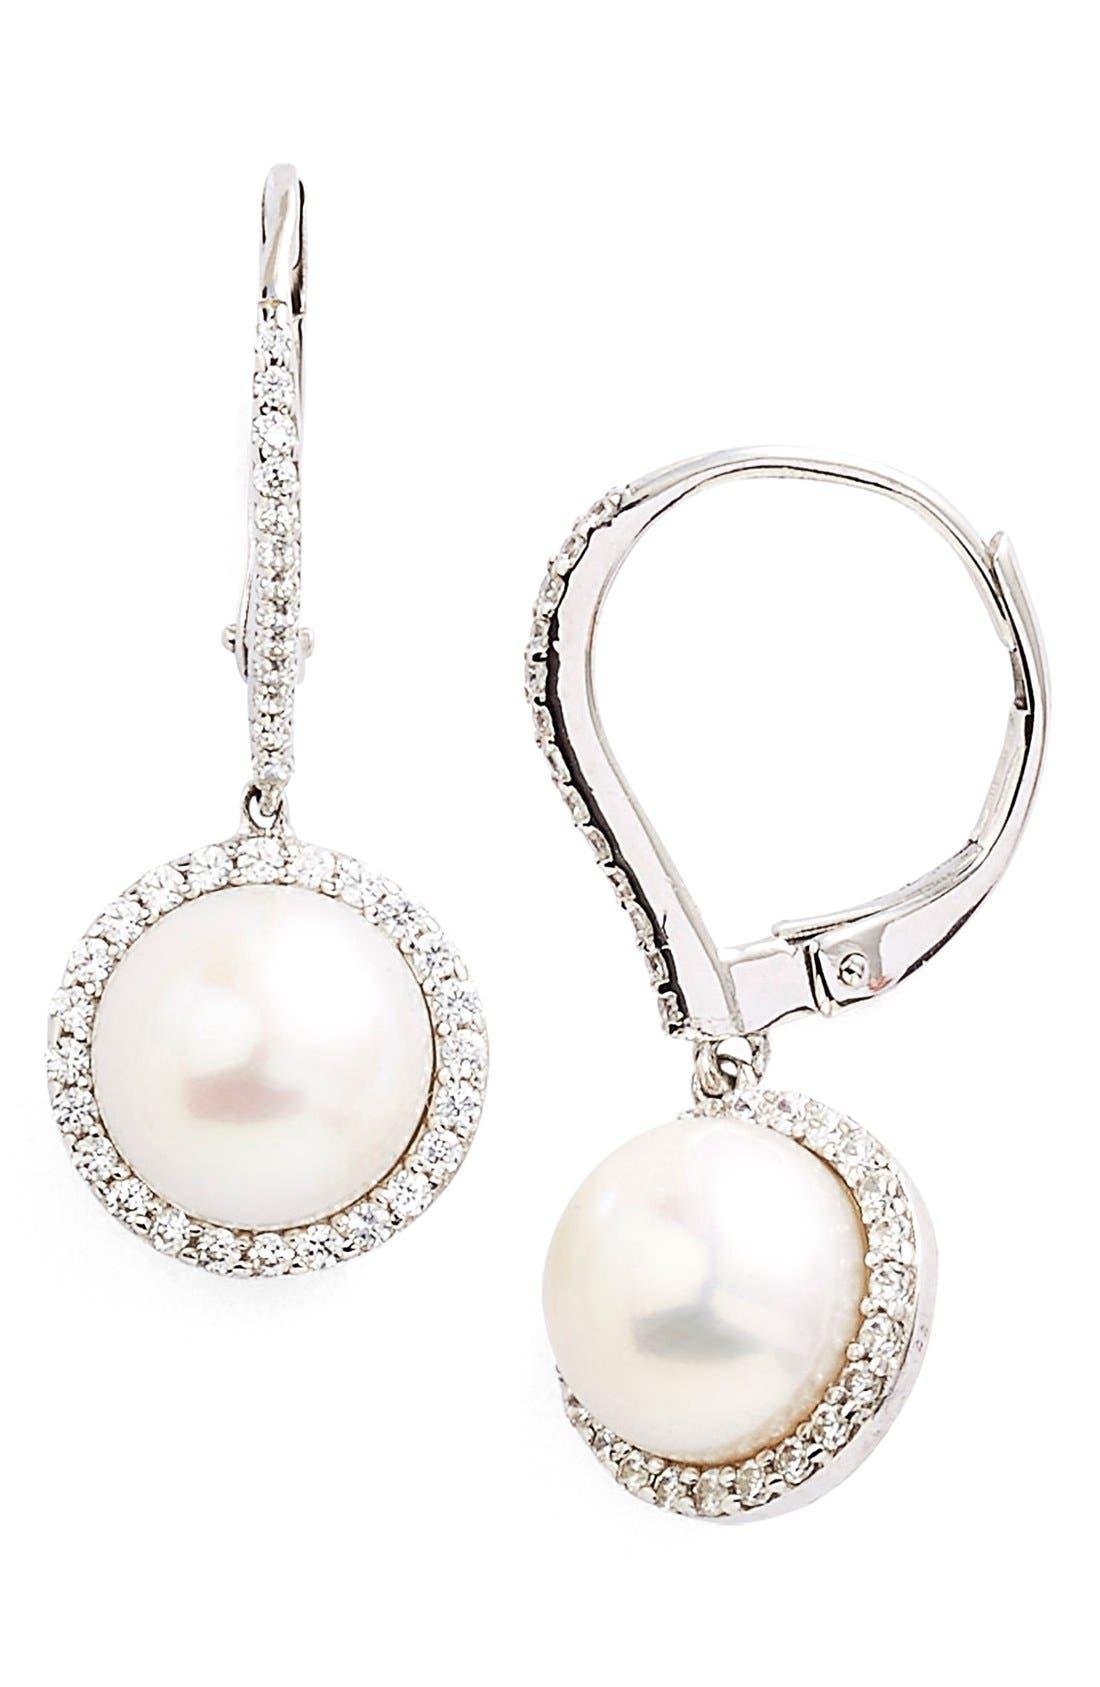 'Lassaire' Pearl Drop Earrings,                             Main thumbnail 1, color,                             SILVER/ CLEAR